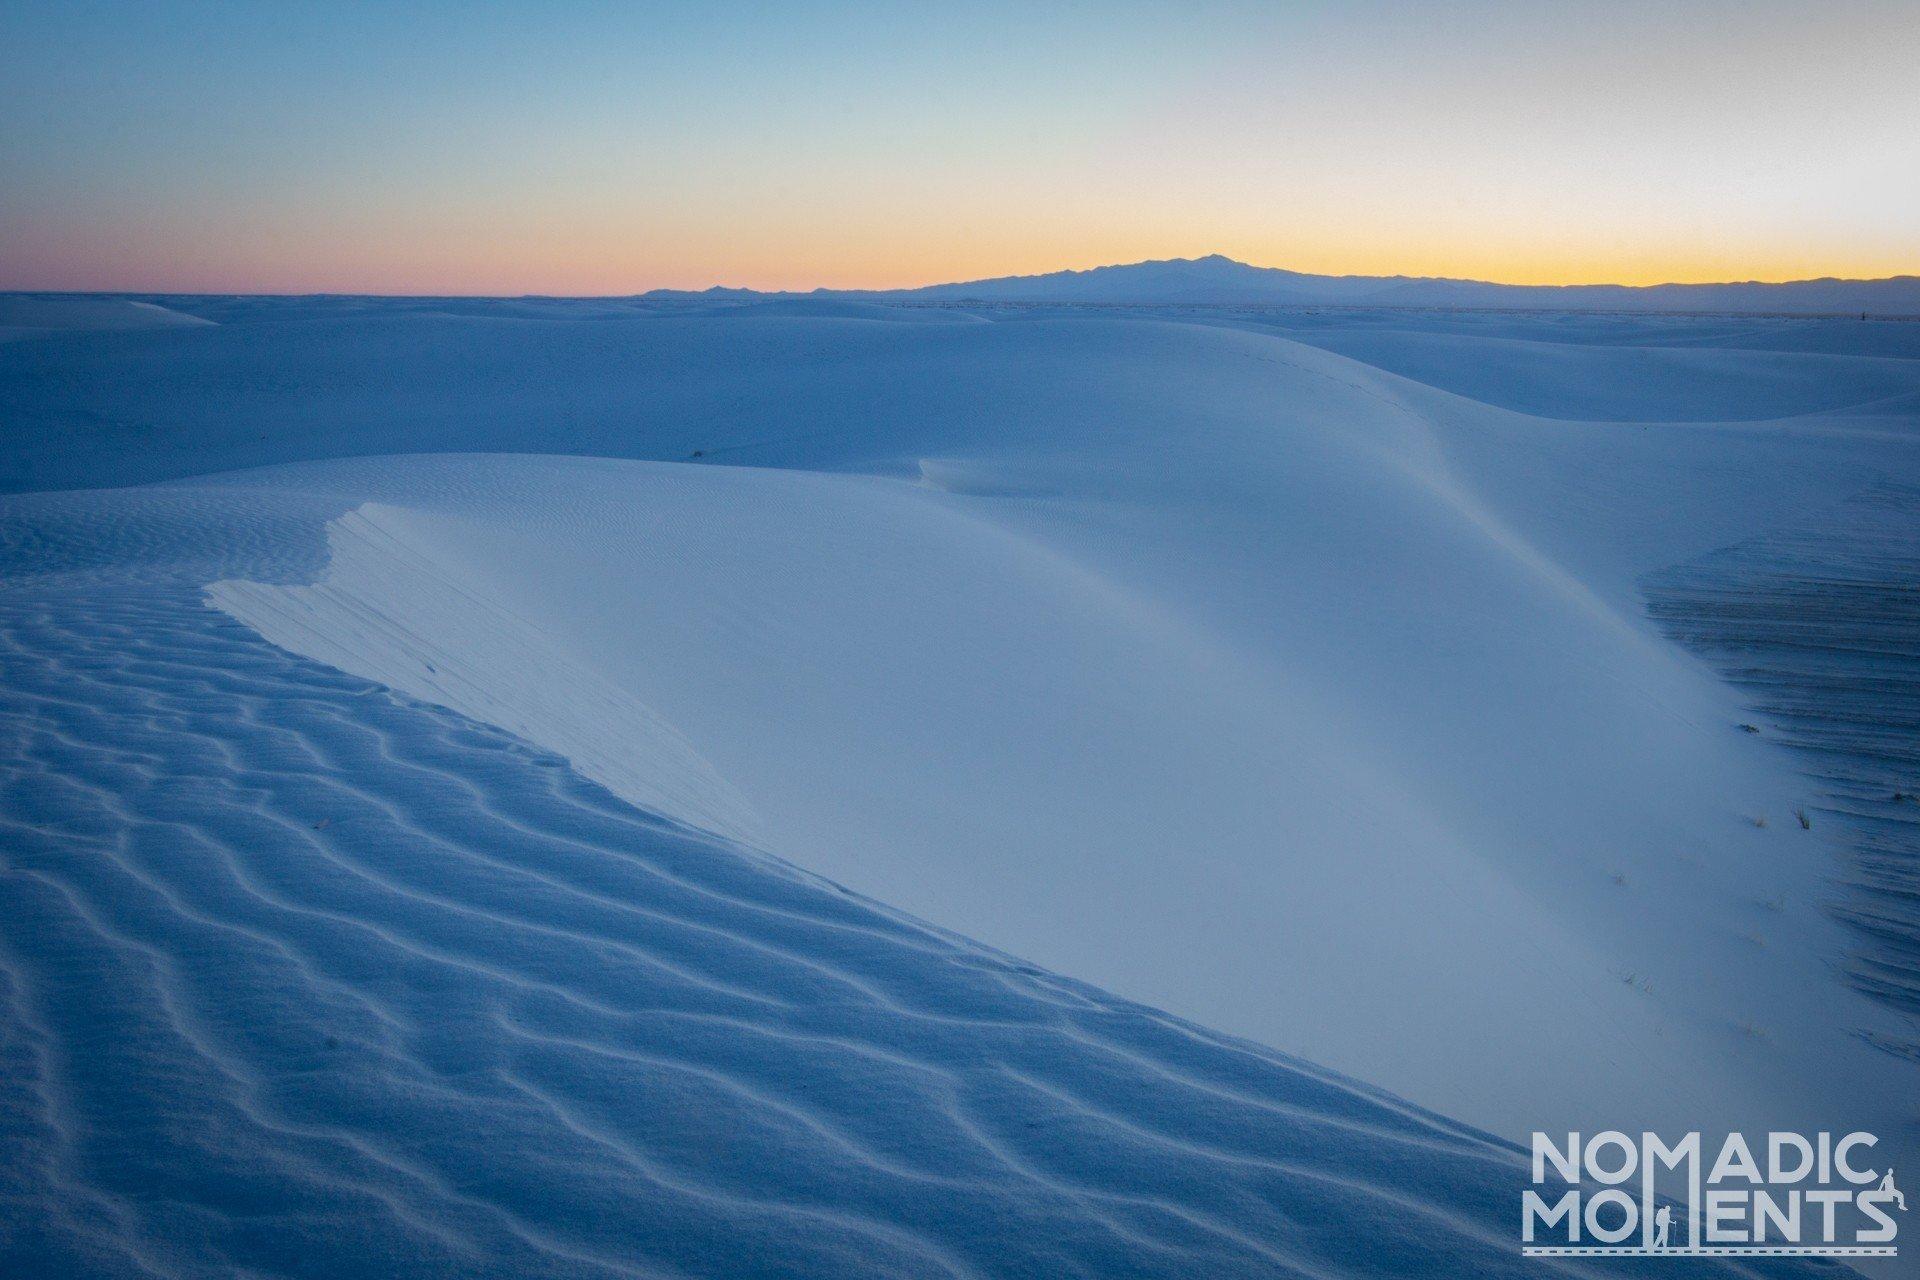 Memorable Nomadic Moments - White Sands National Park Sunrise